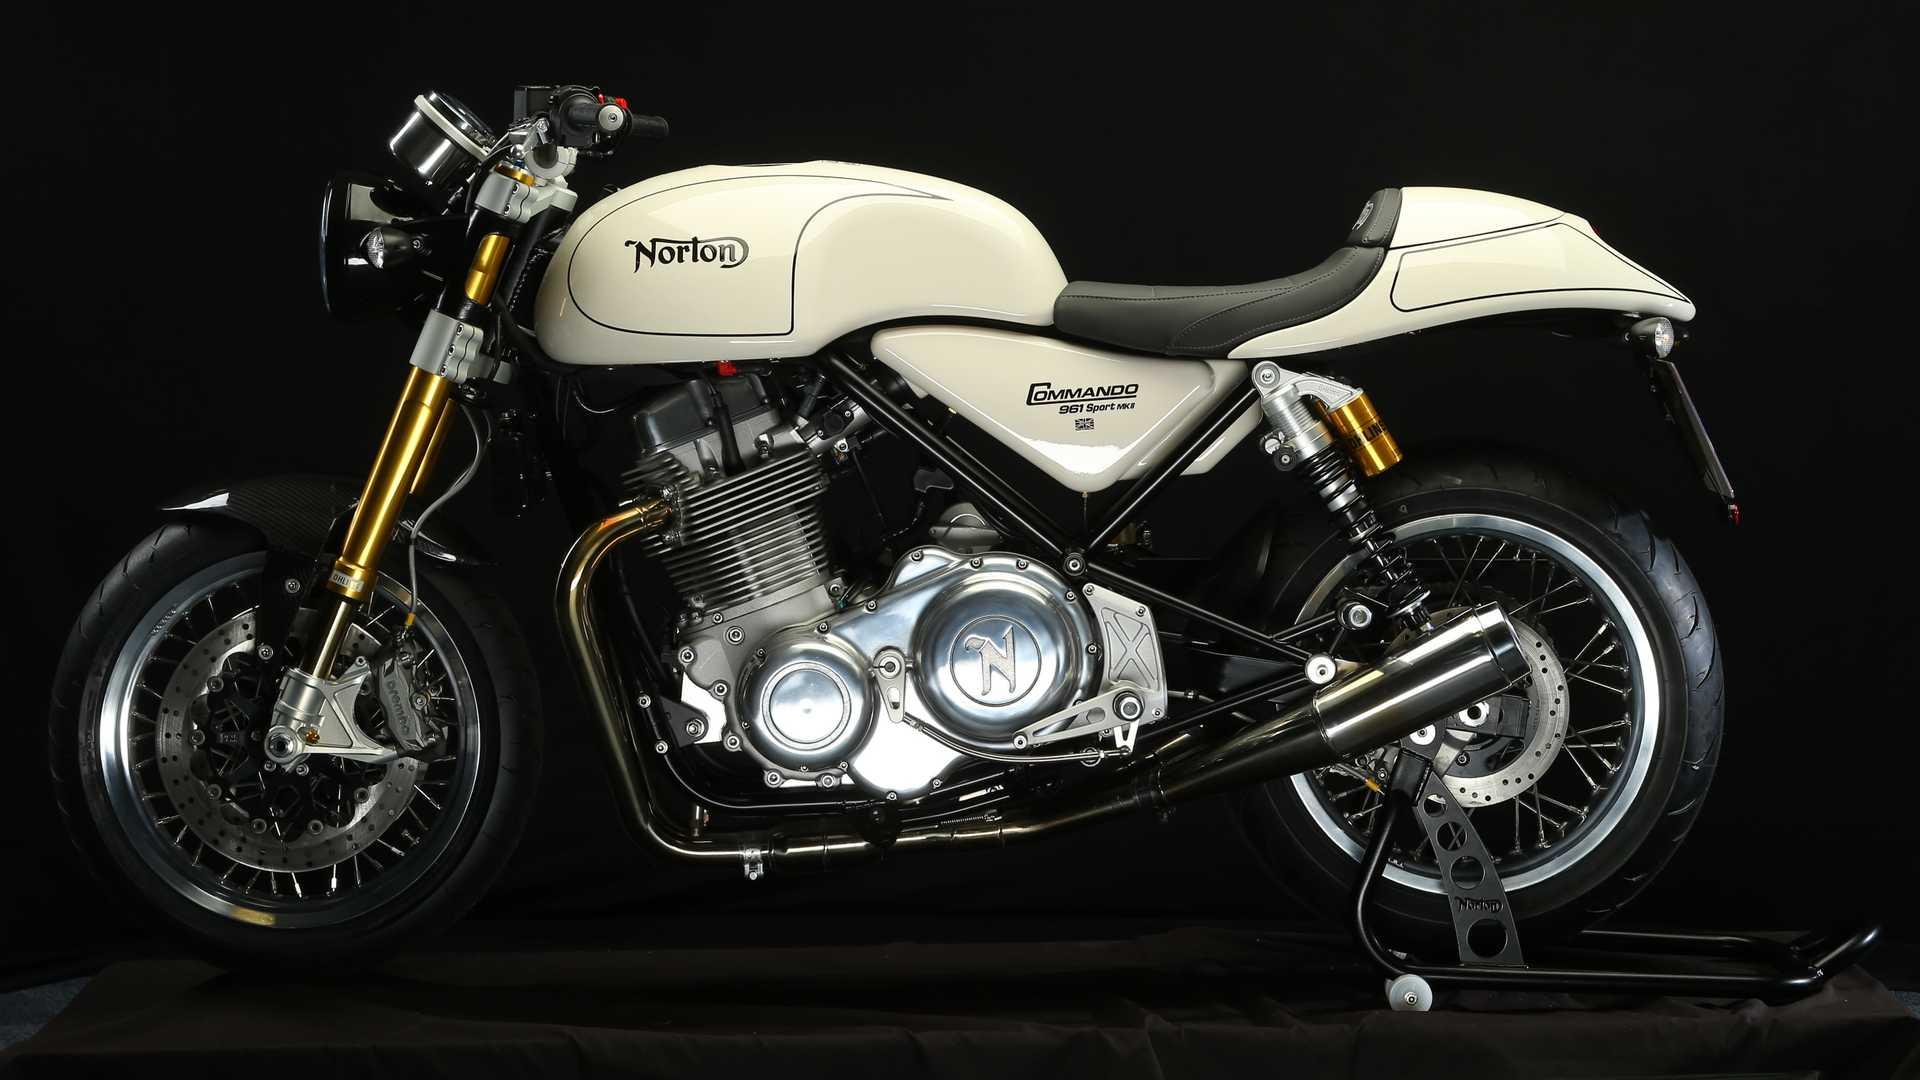 norton-commando-961